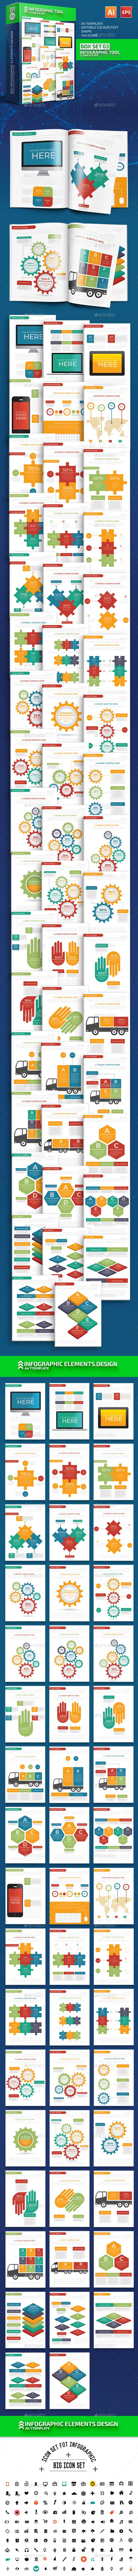 Box Set 03 Infographic Tools Design - Infographics